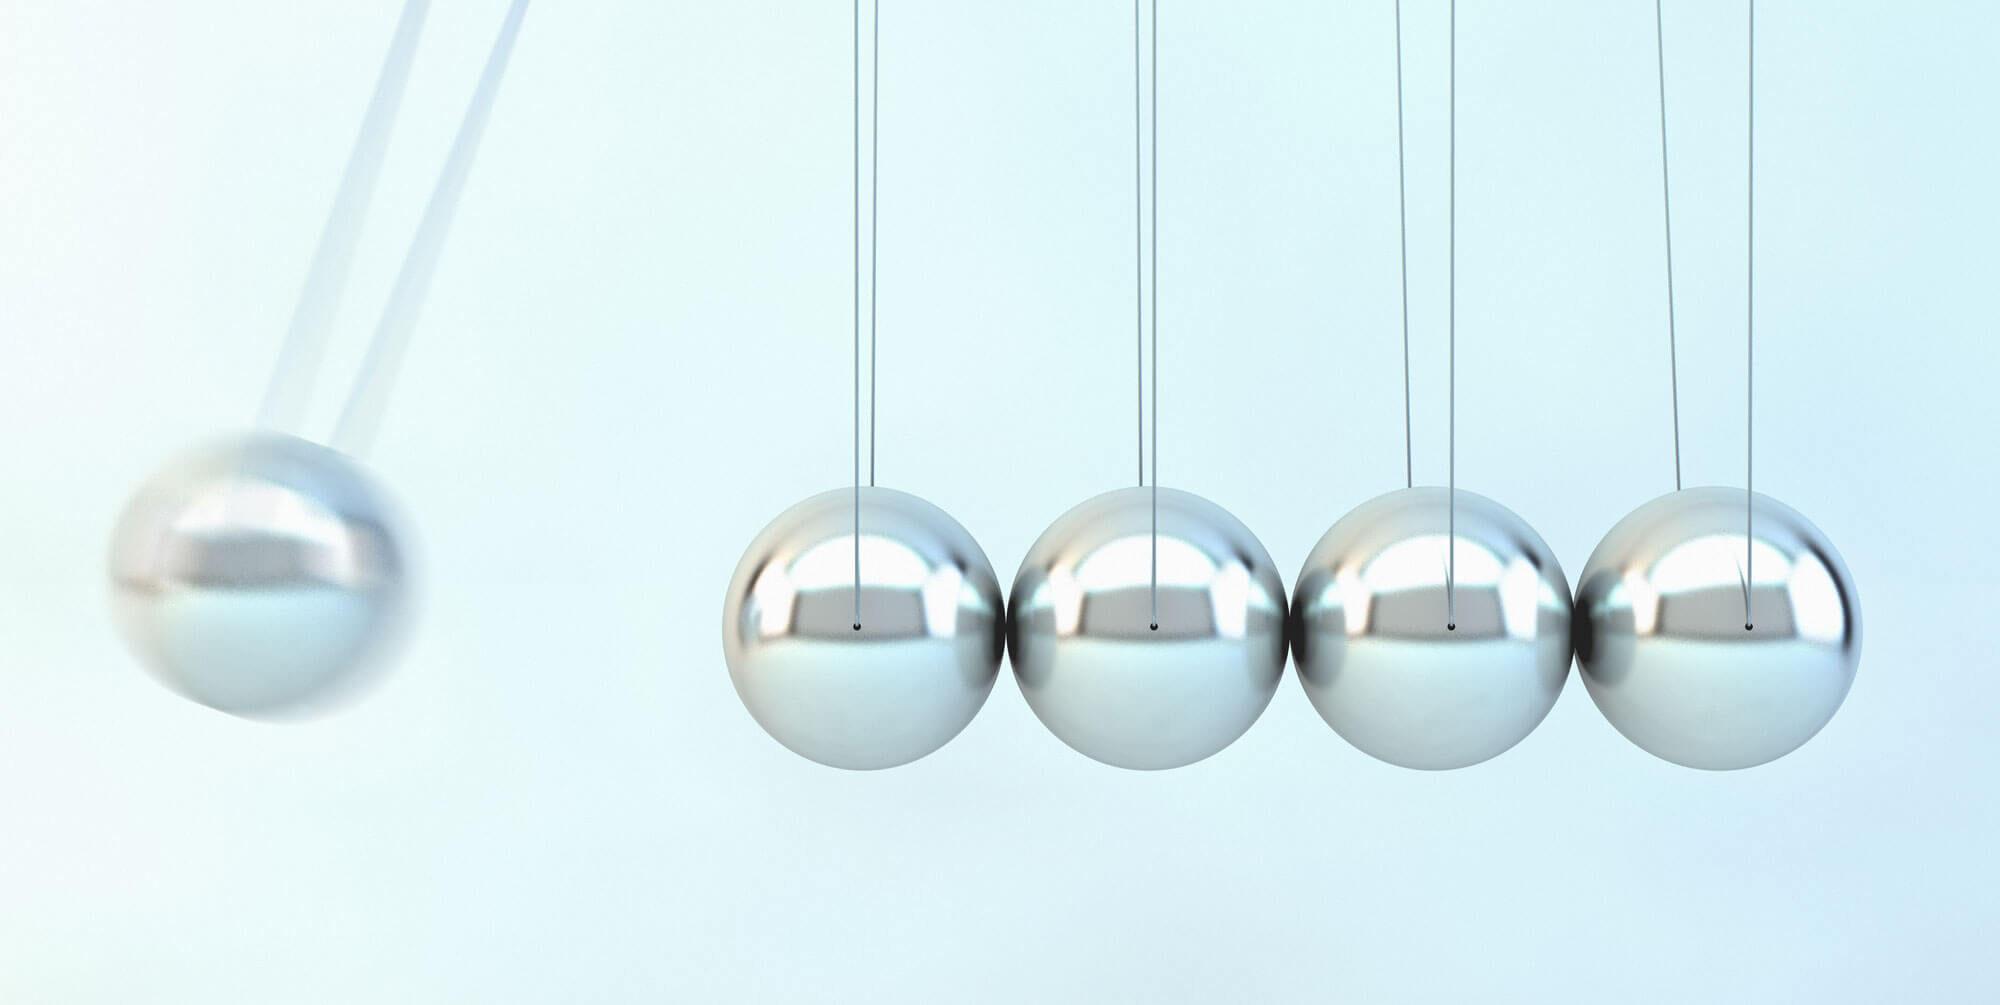 SNW-Website-Now-my-Pendulum-Swings-2000x1005